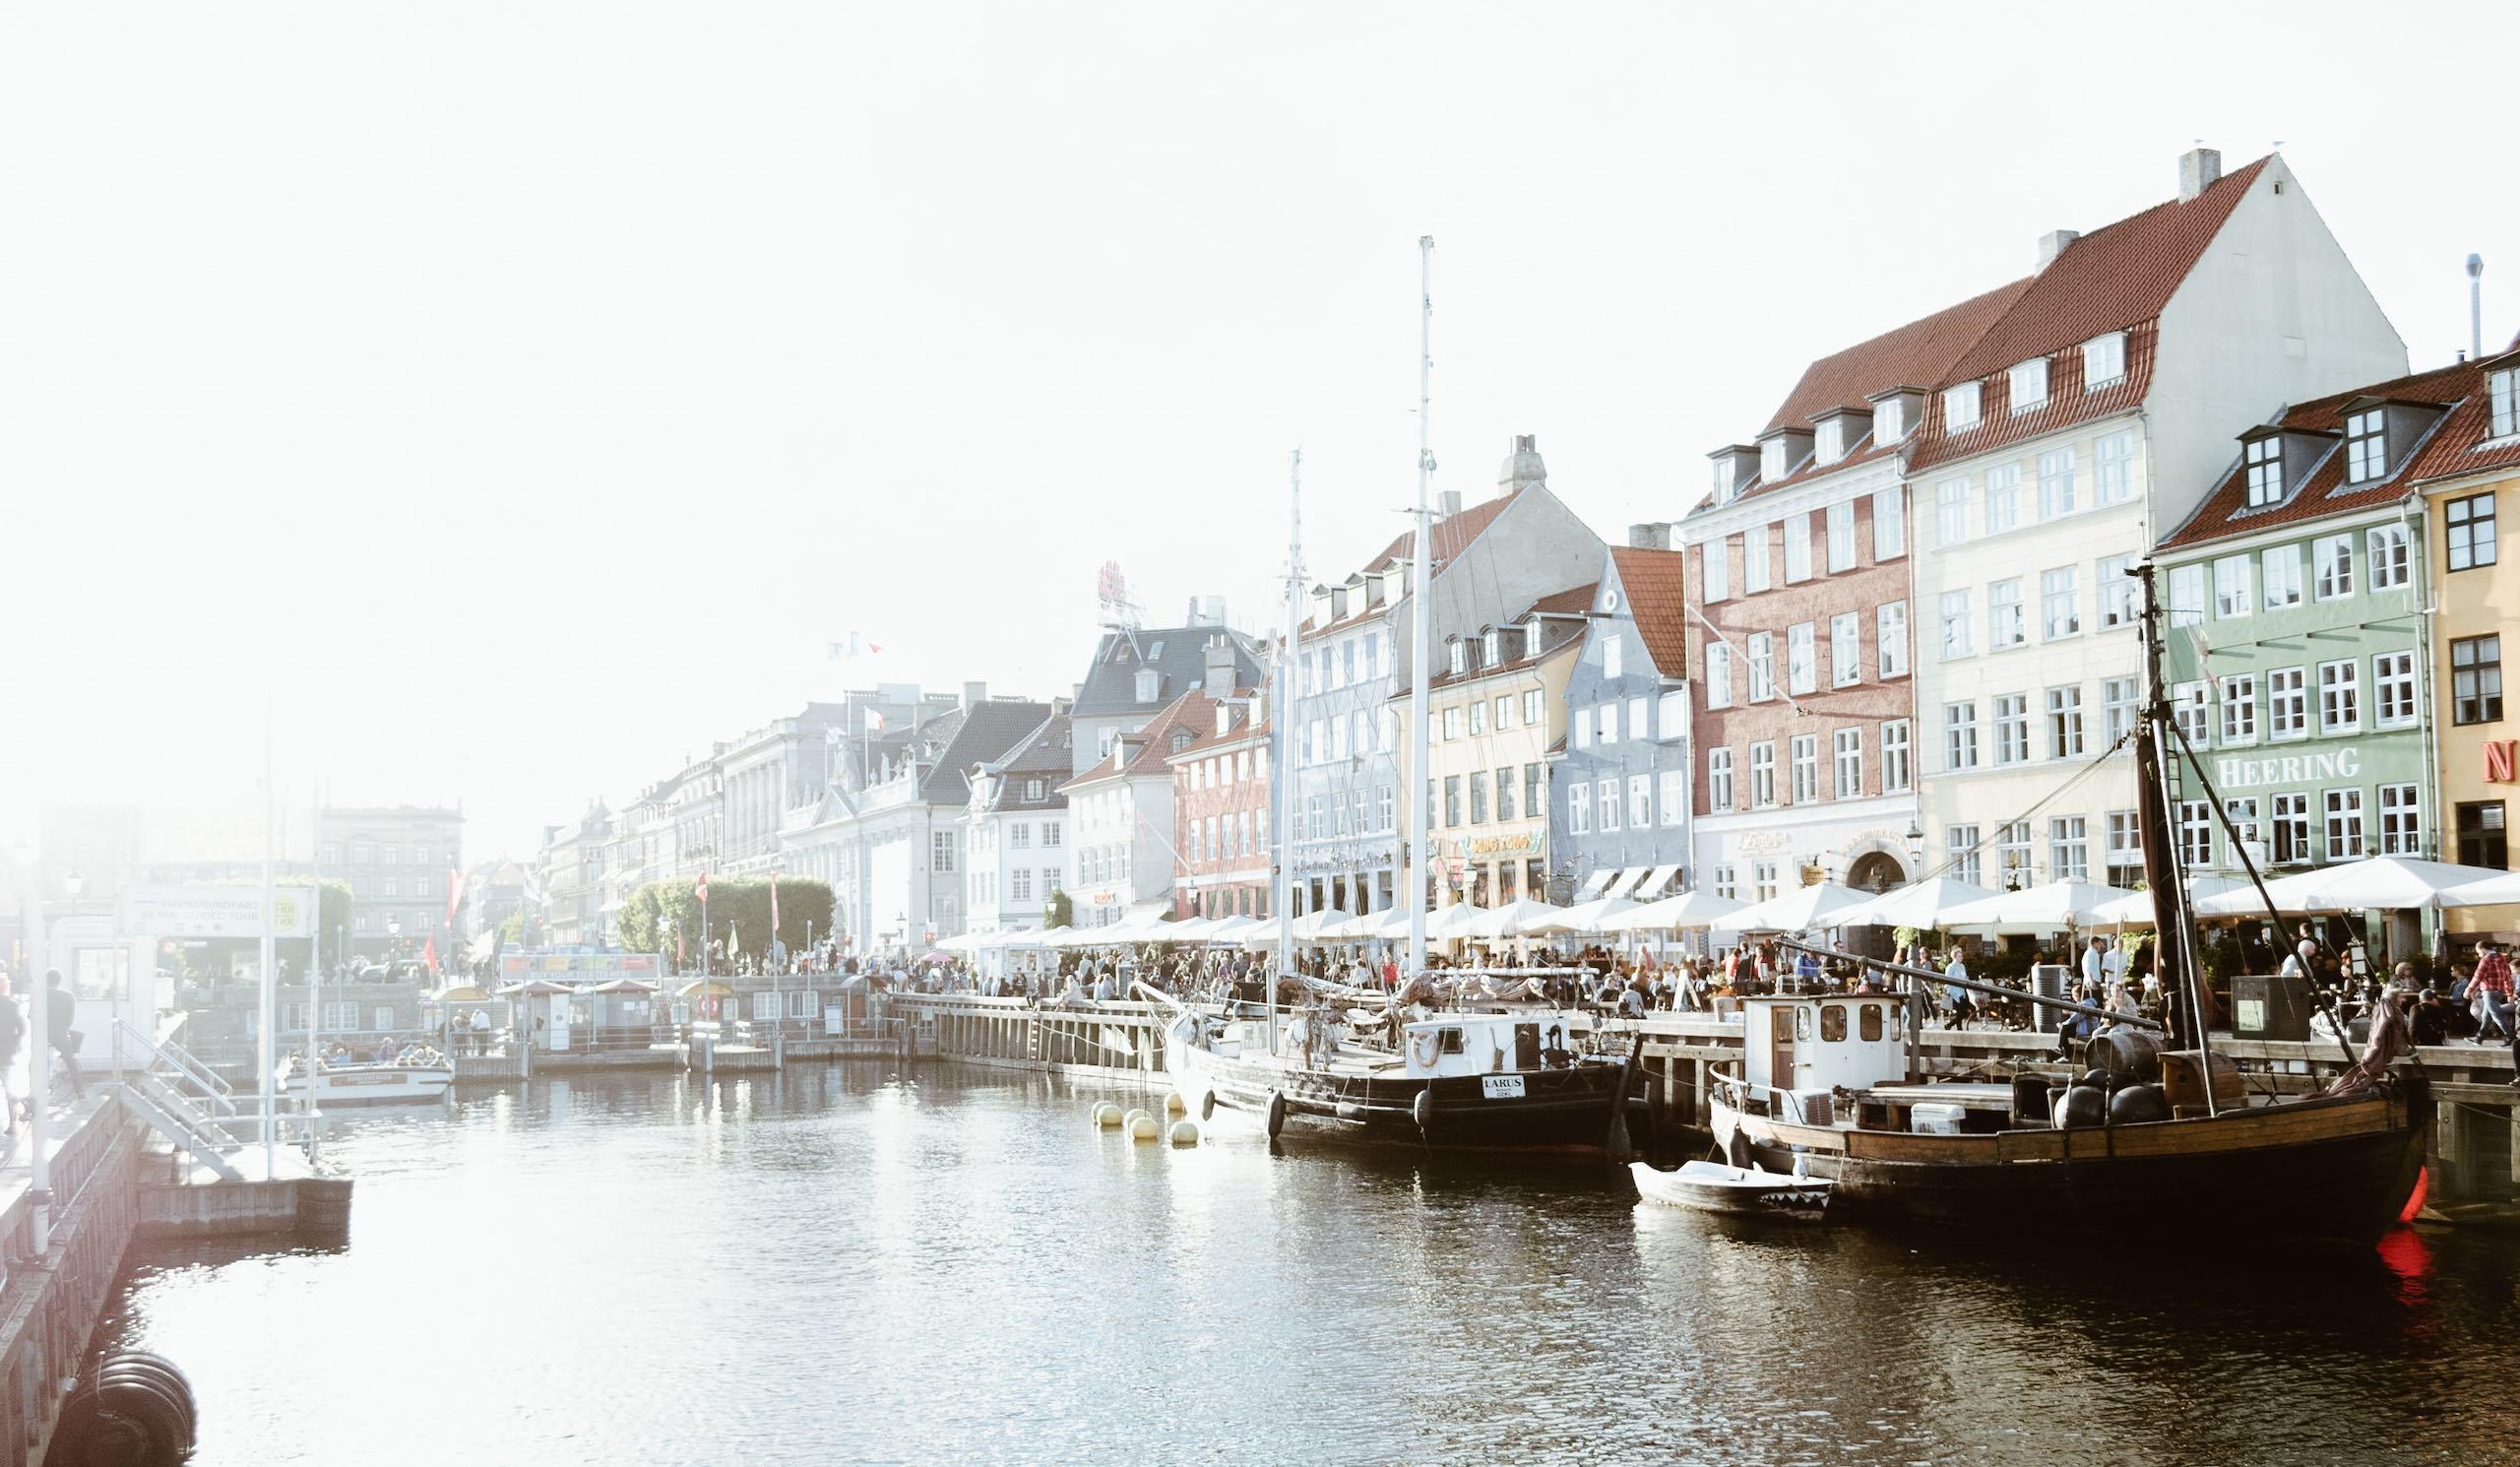 Copenhagen | Photo: Raoul Croes